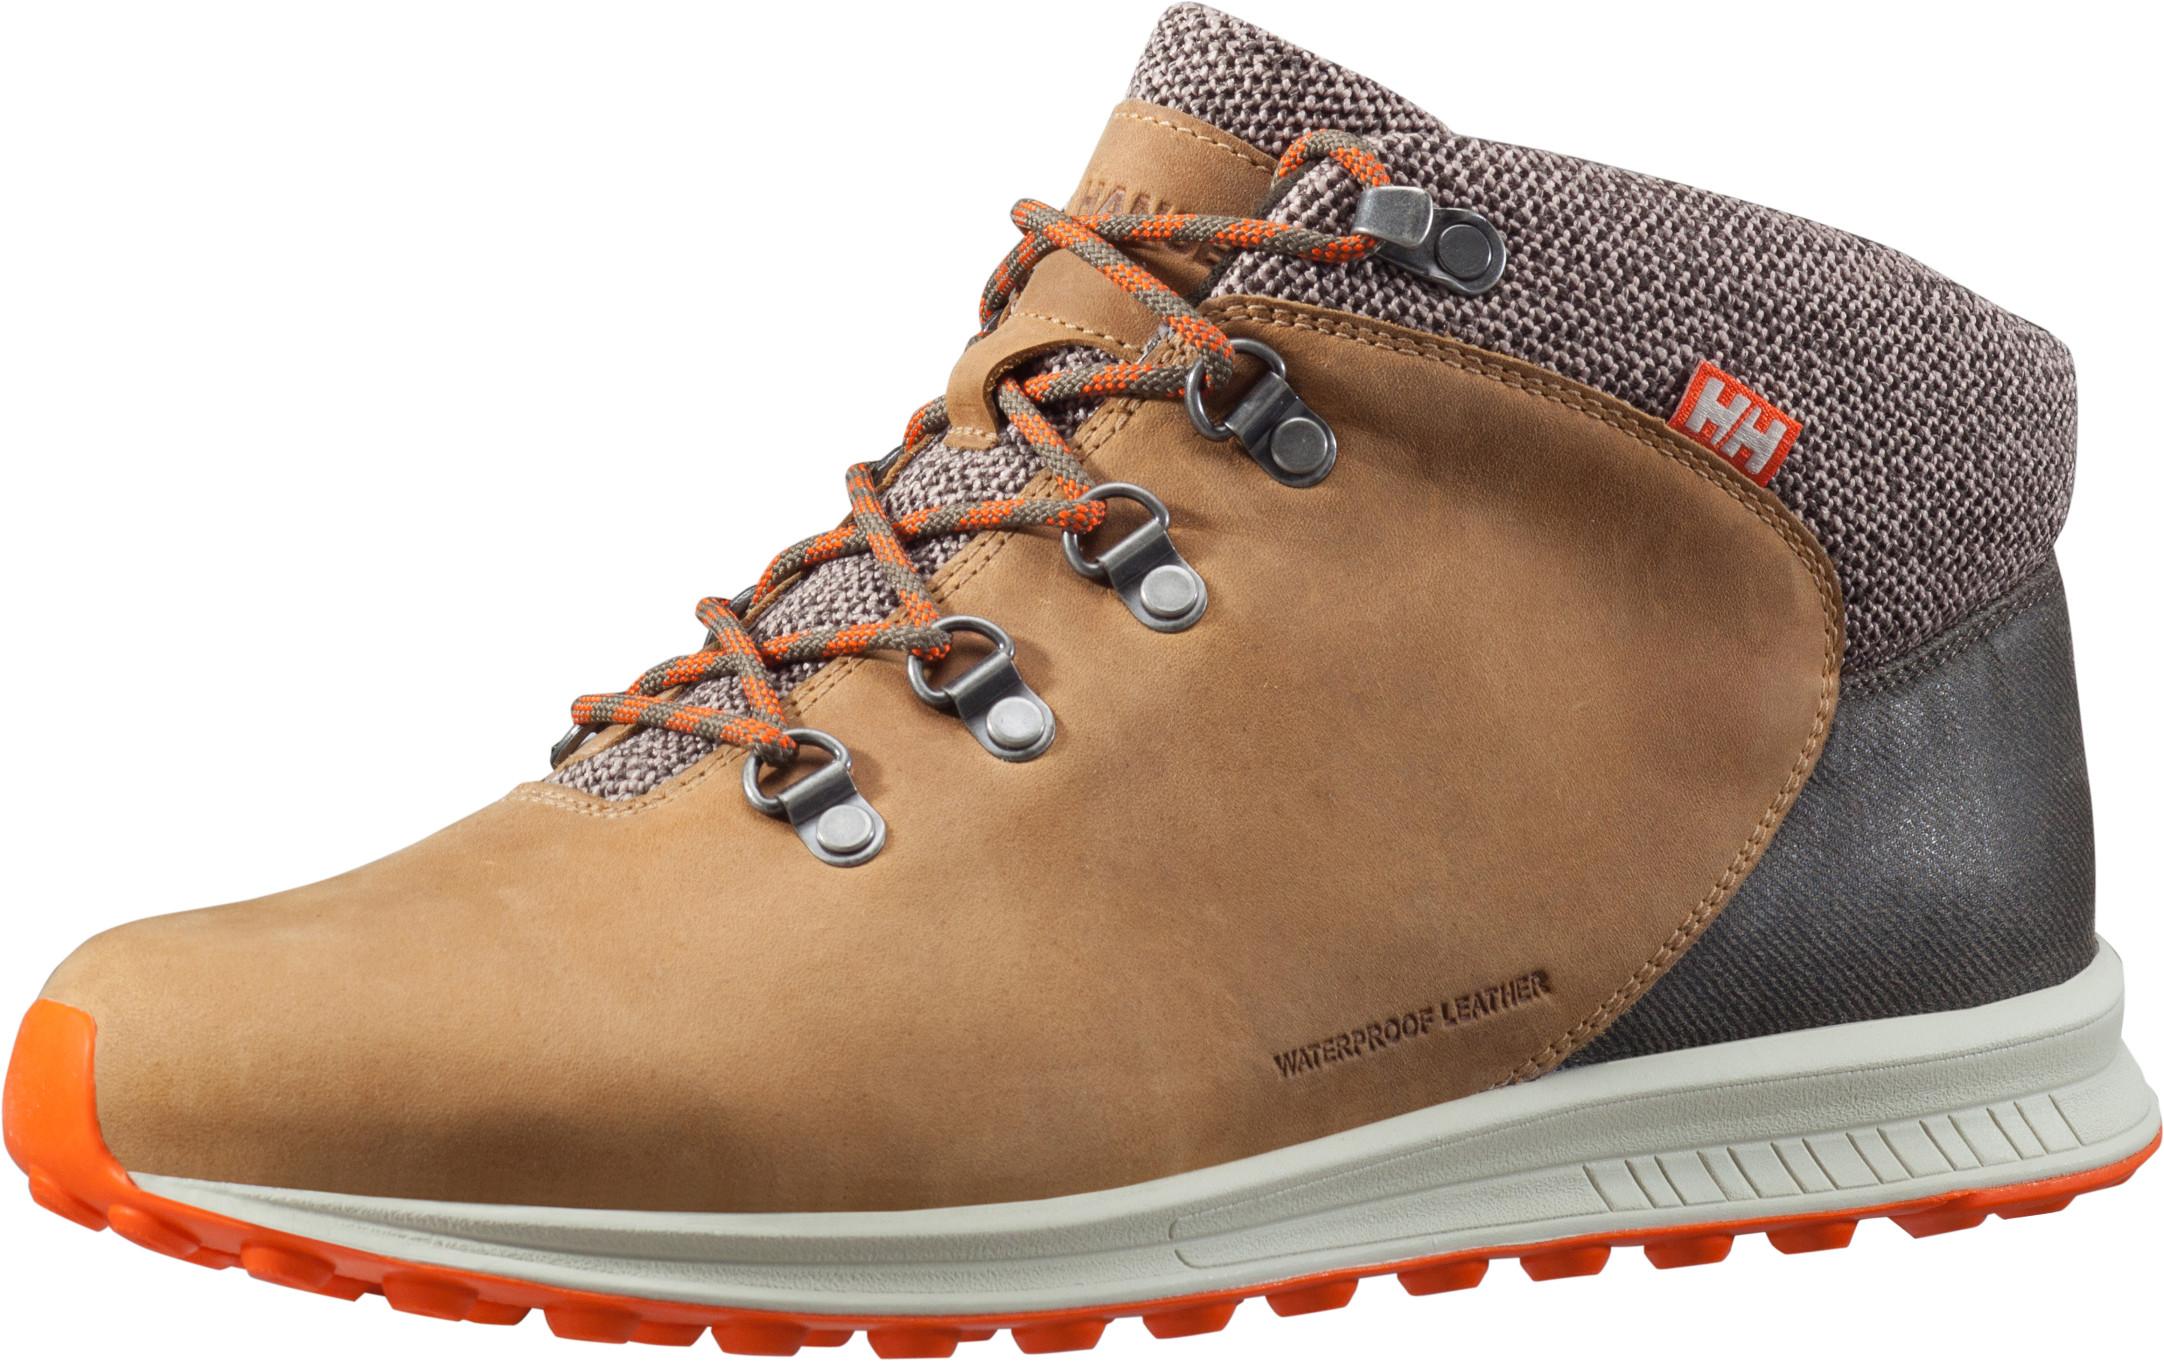 ade04d27b97 Helly Hansen Jaythen X Casual Shoe - Men's